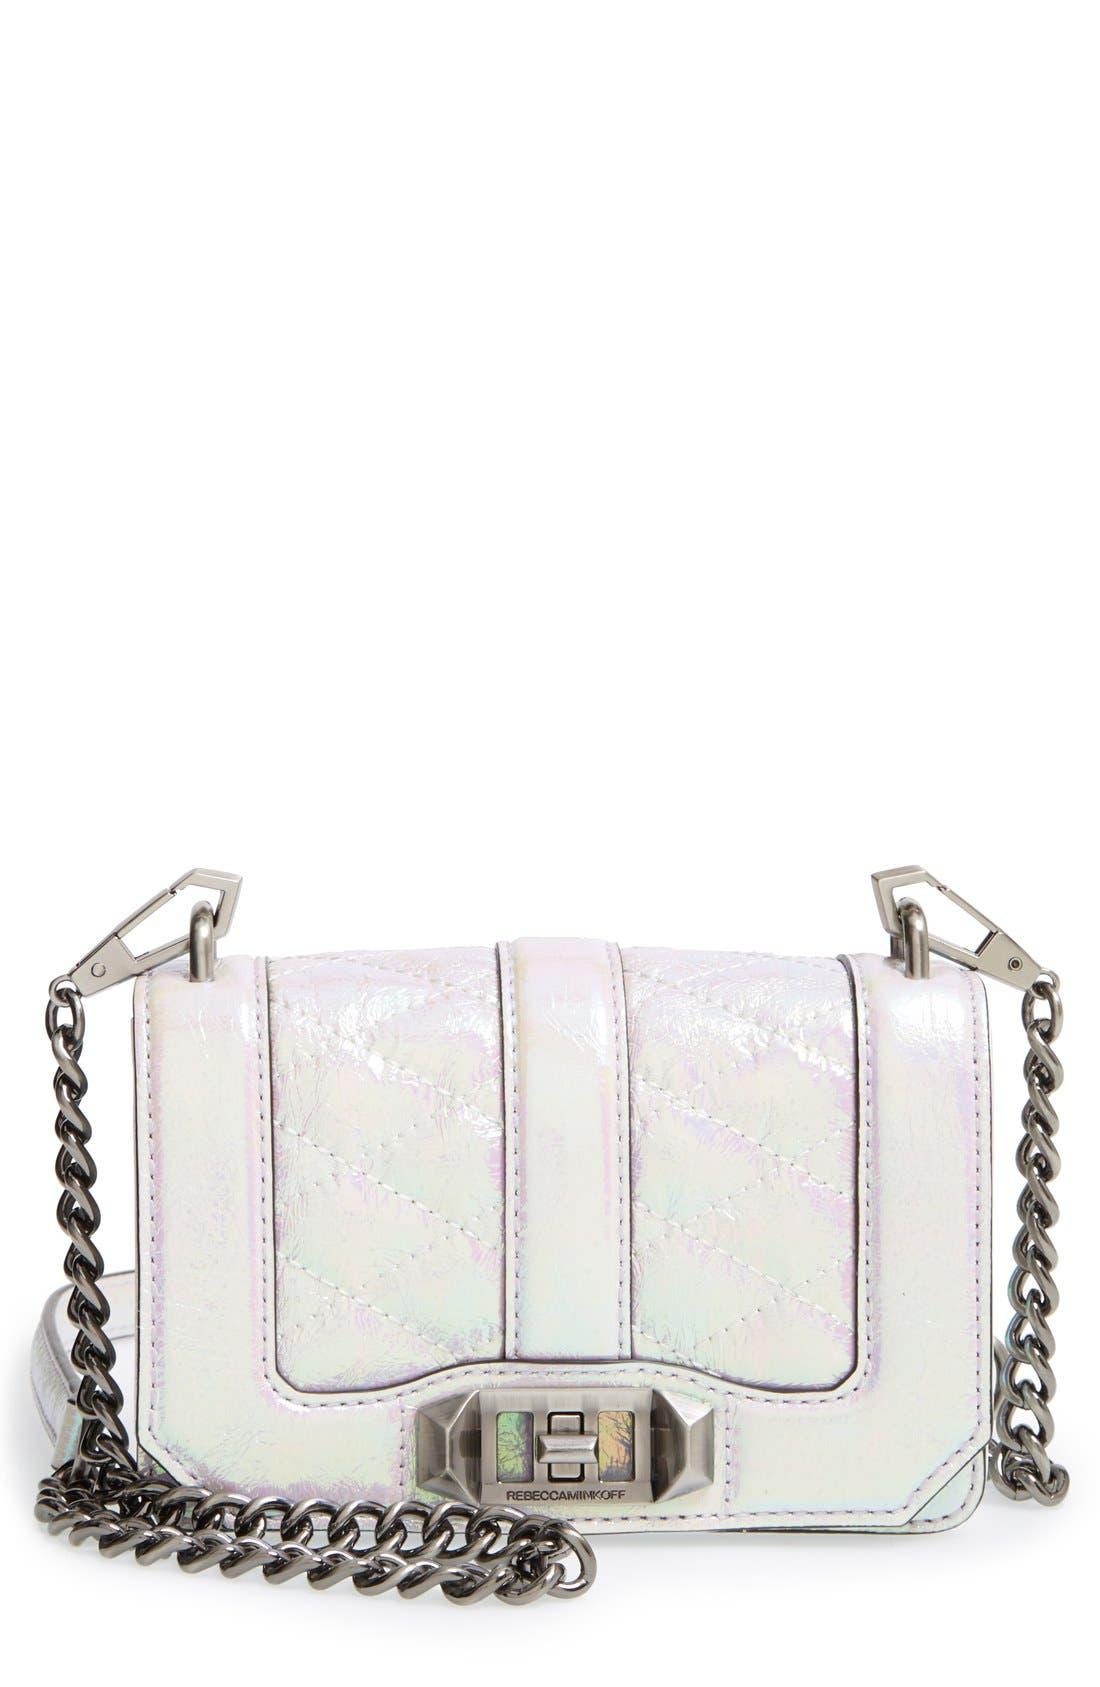 Alternate Image 1 Selected - Rebecca Minkoff 'Mini Love' Convertible Crossbody Bag